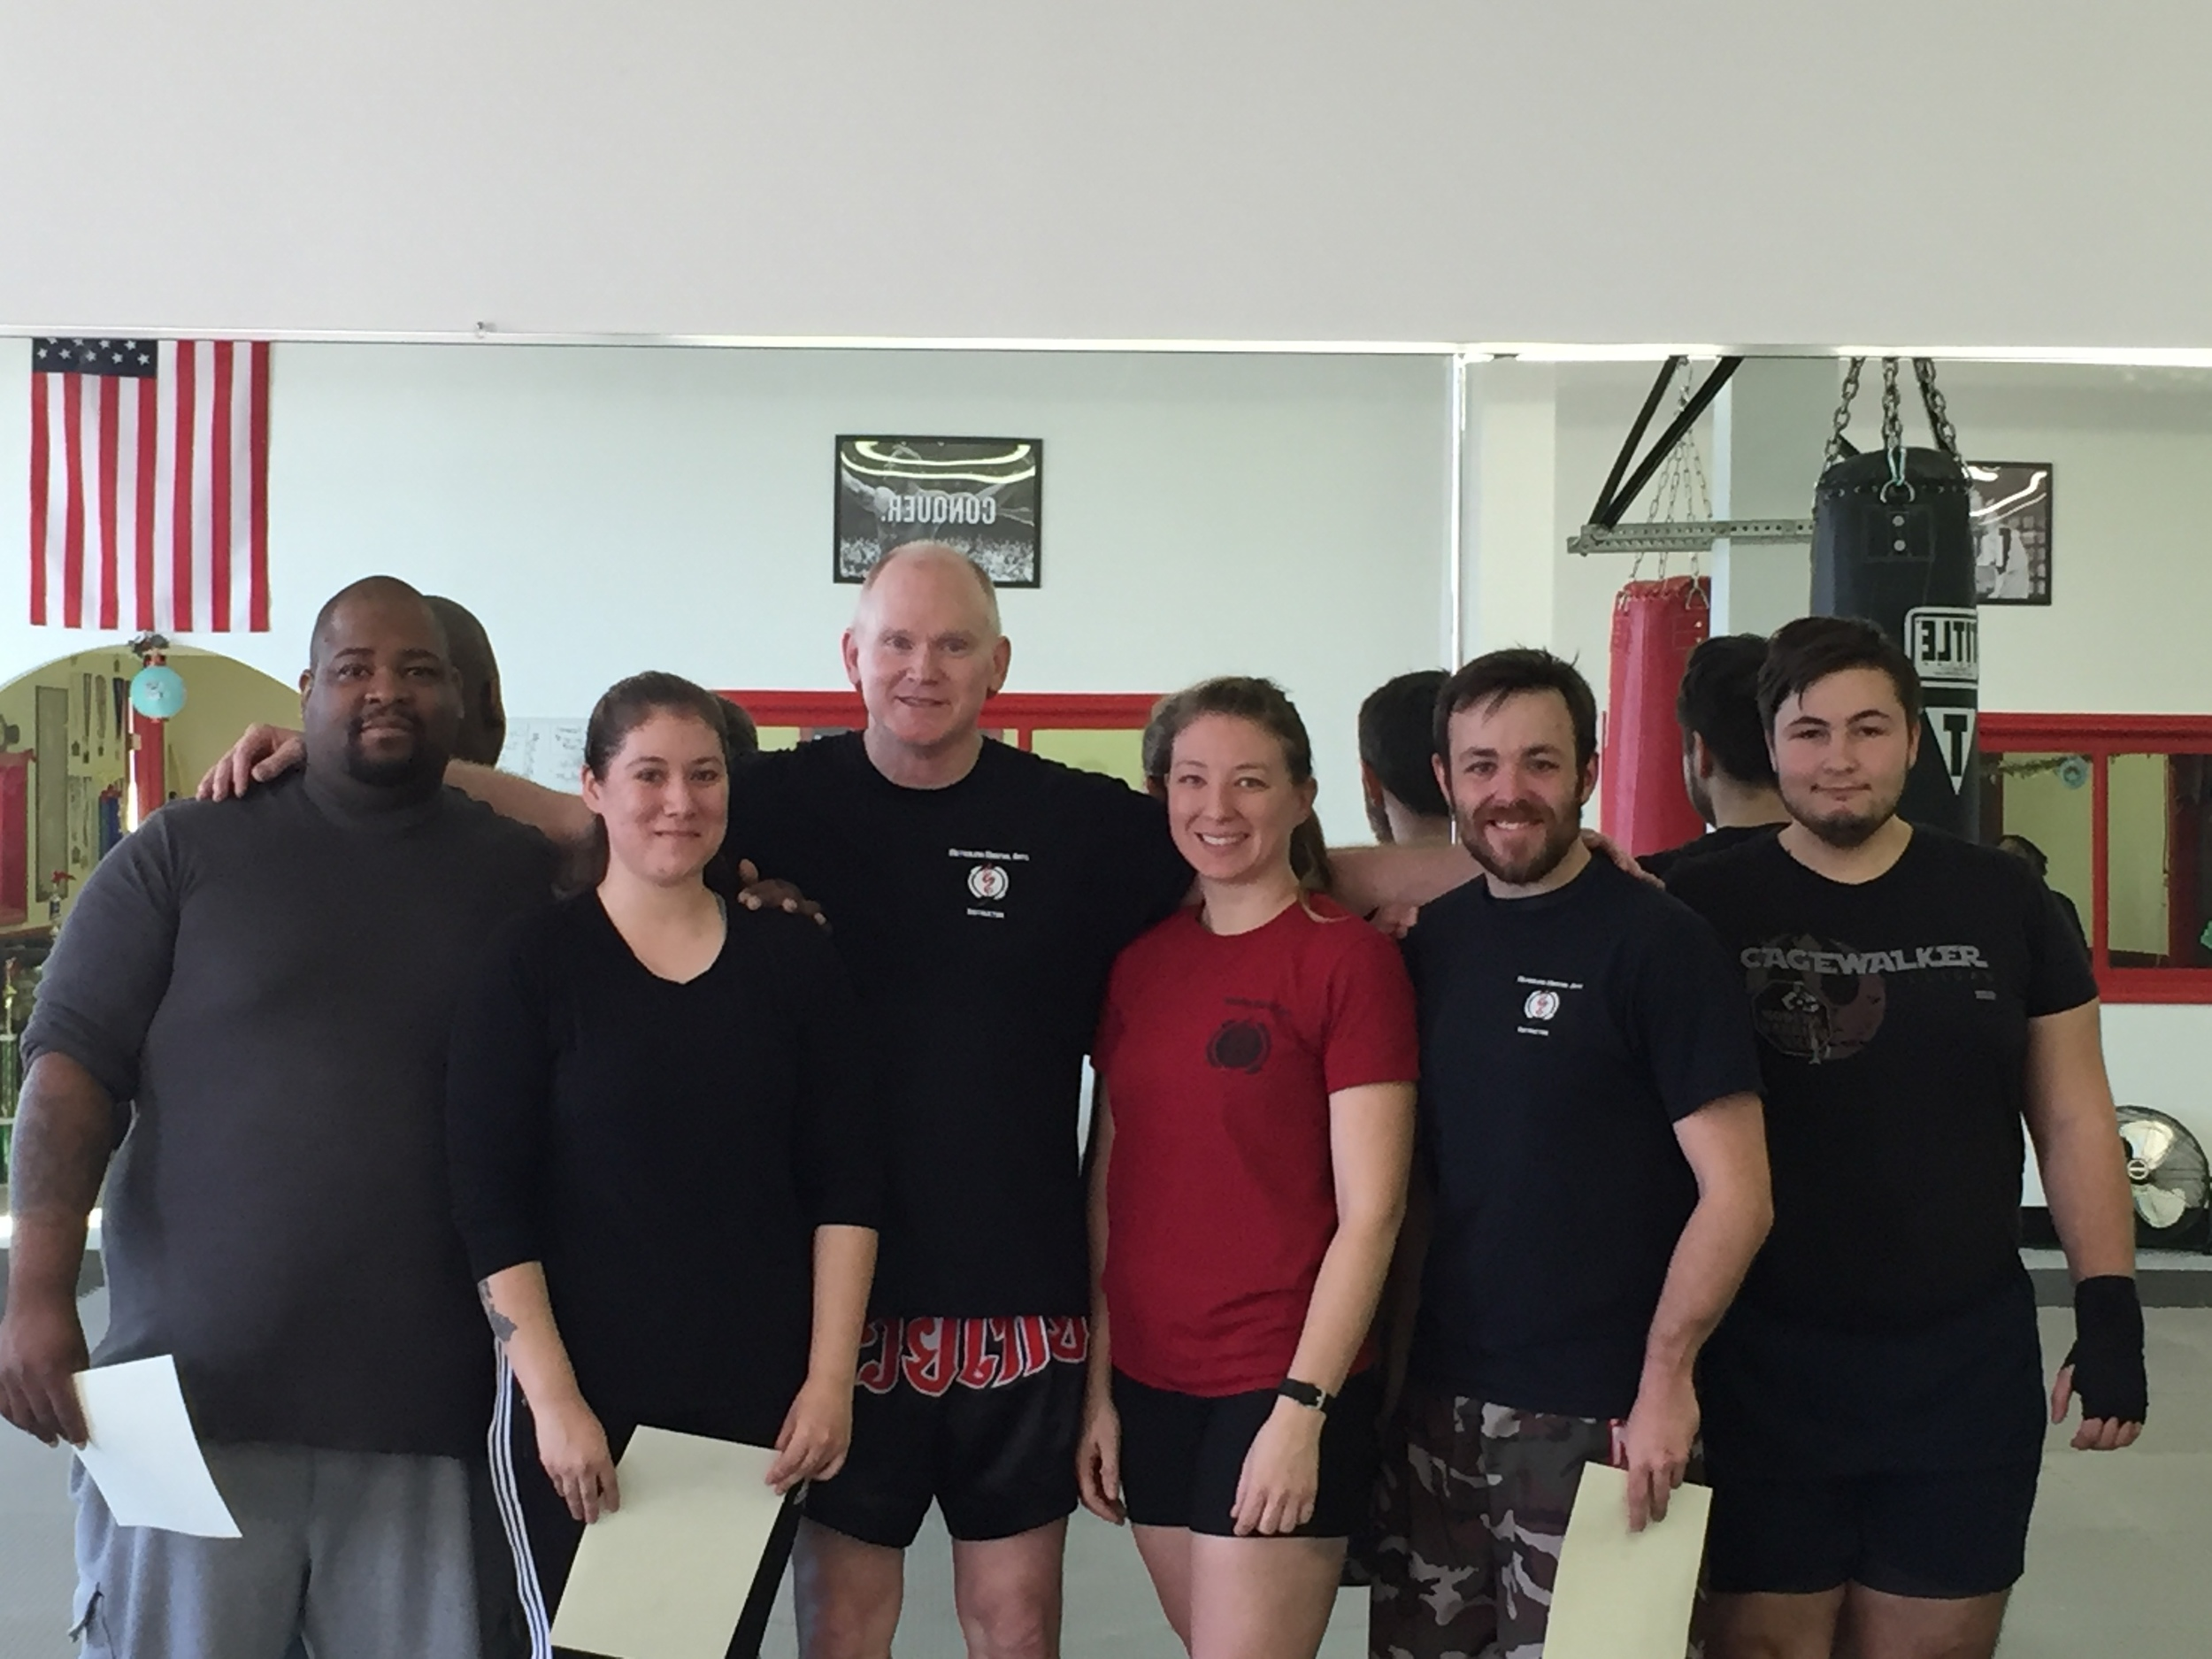 Kola, Brittney, Coach Bill, Erin, Ed, and matt